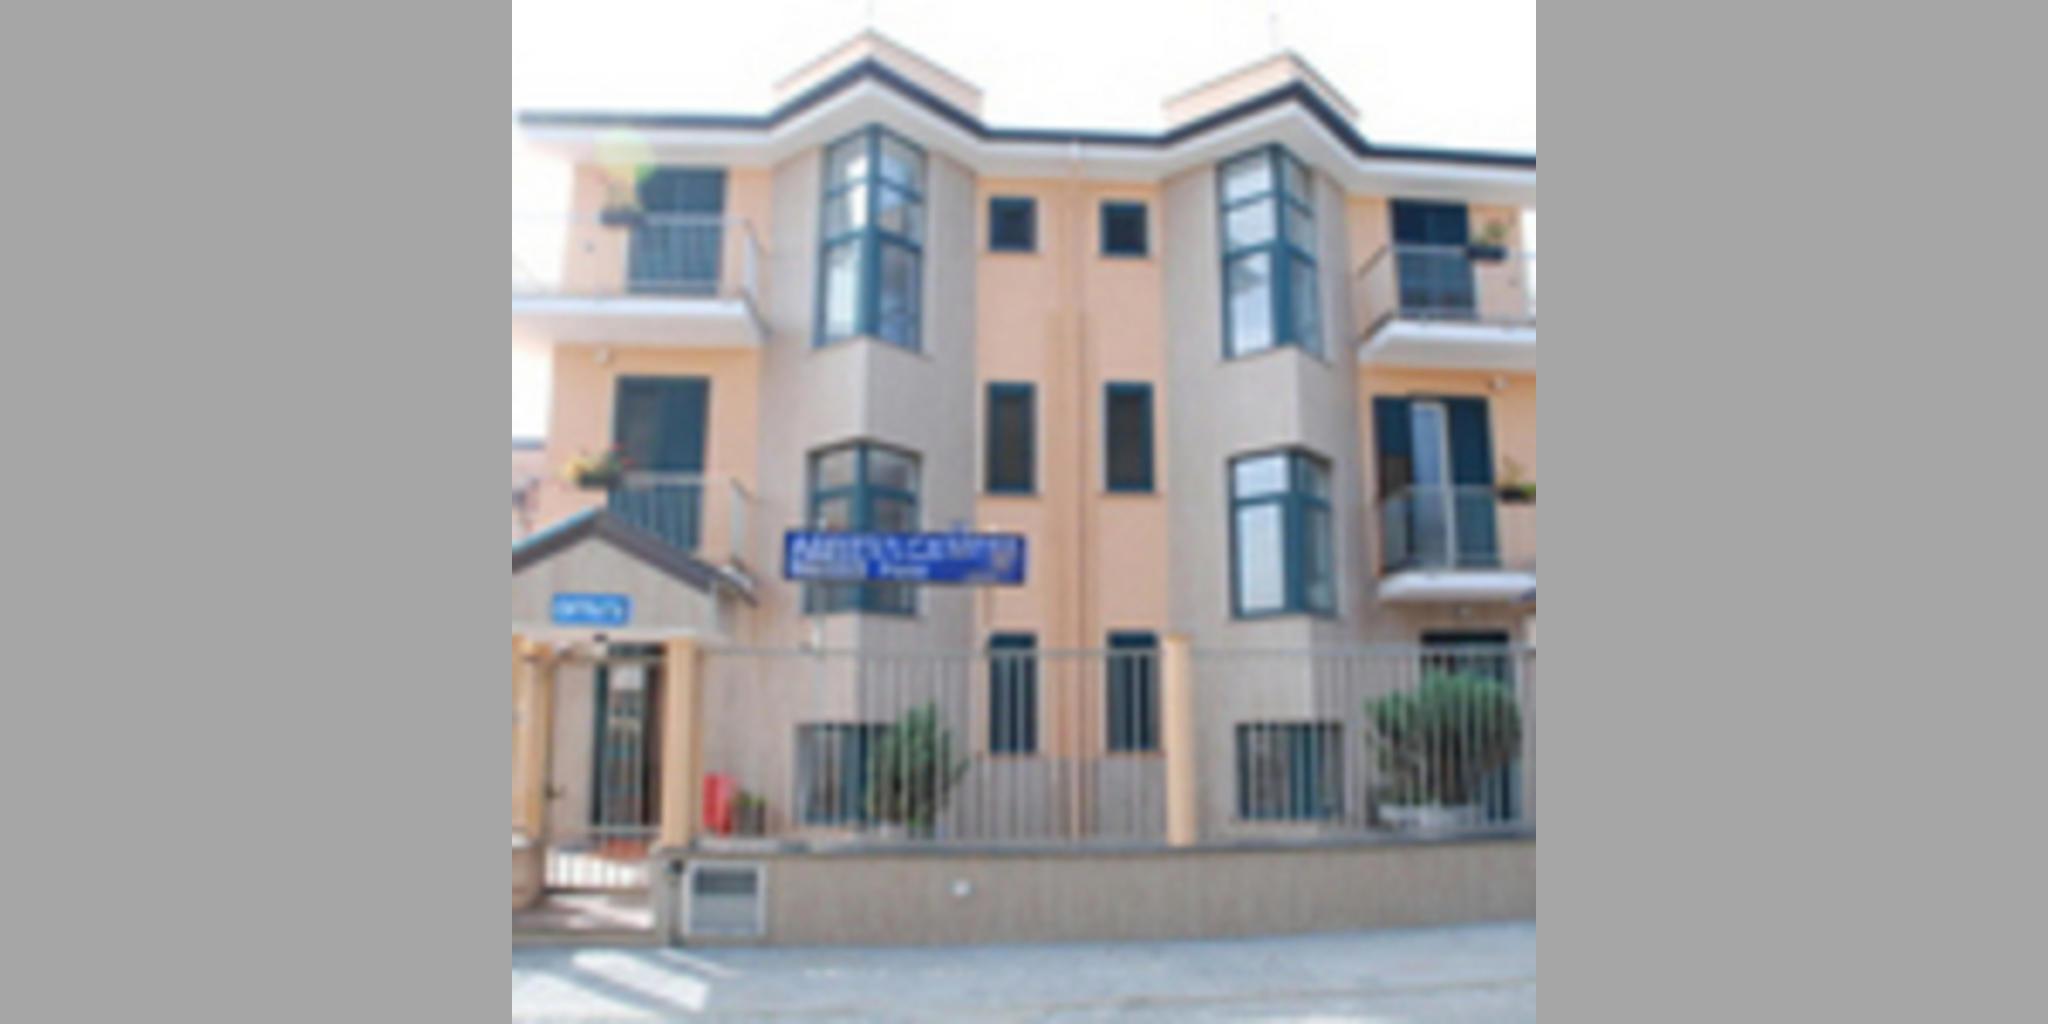 Guest House Sesto San Giovanni - B&B A Sesto San Giovanni